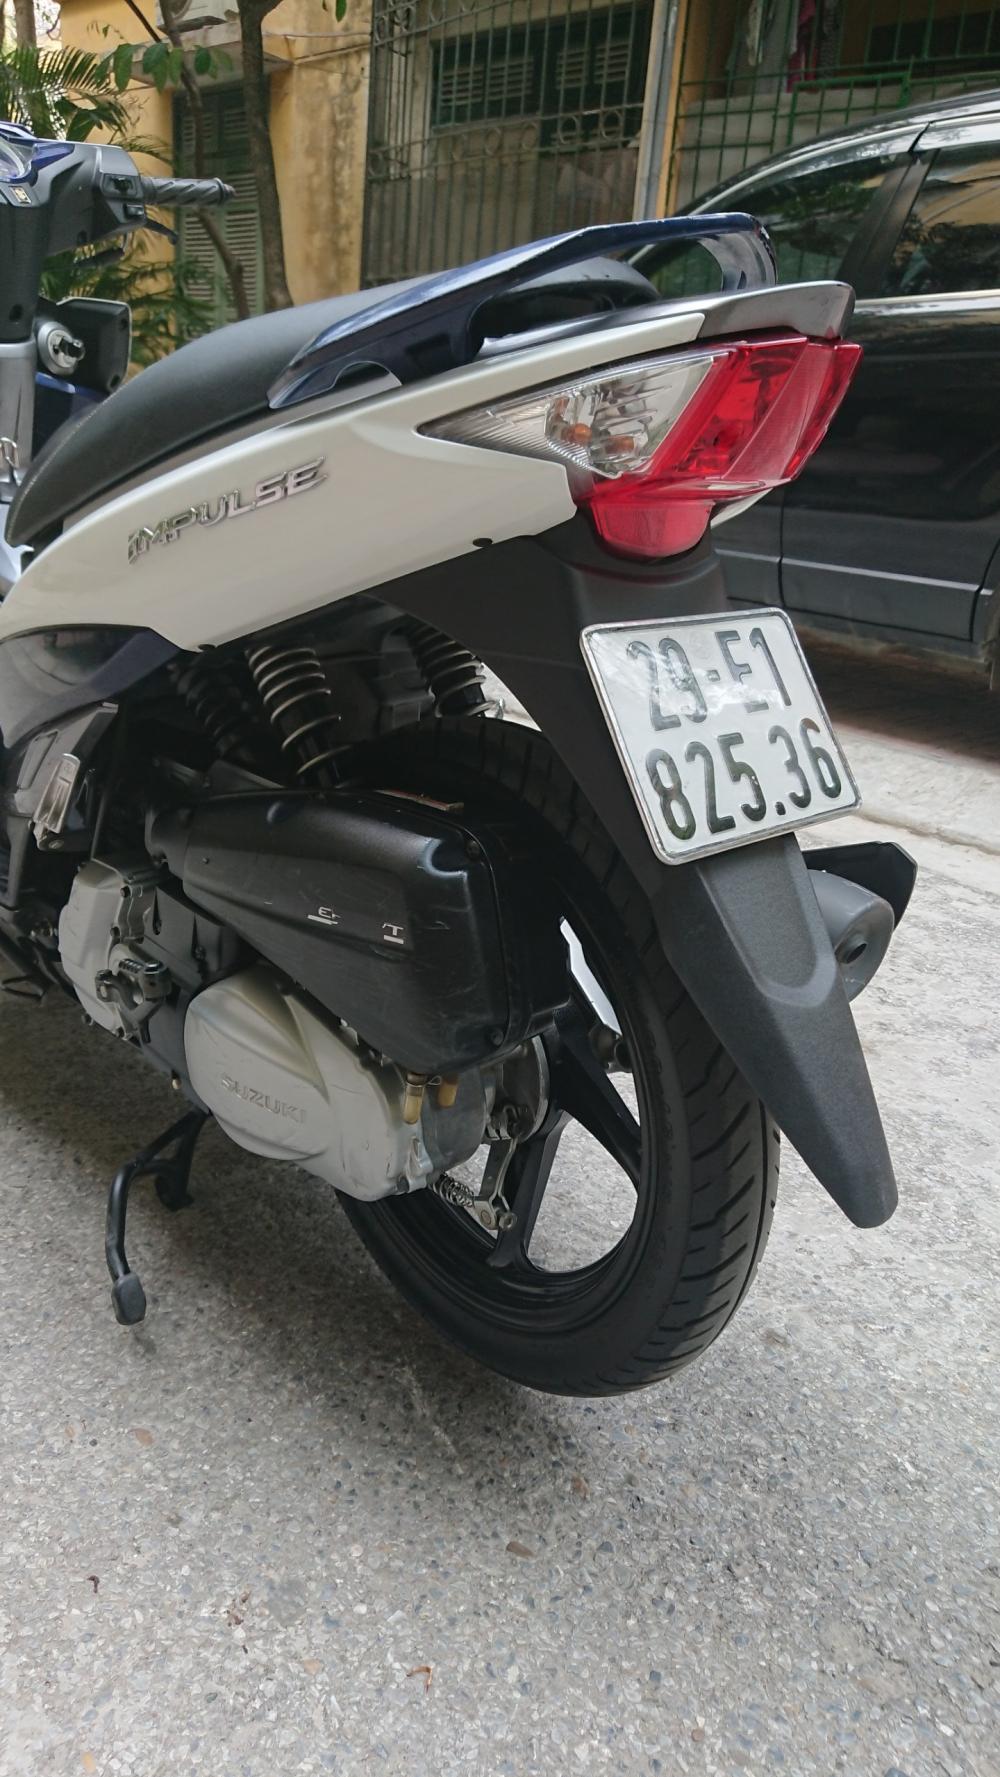 ban xe Suzuki Impulse xanh trang 2015 it dung chinh chu bien HN - 2